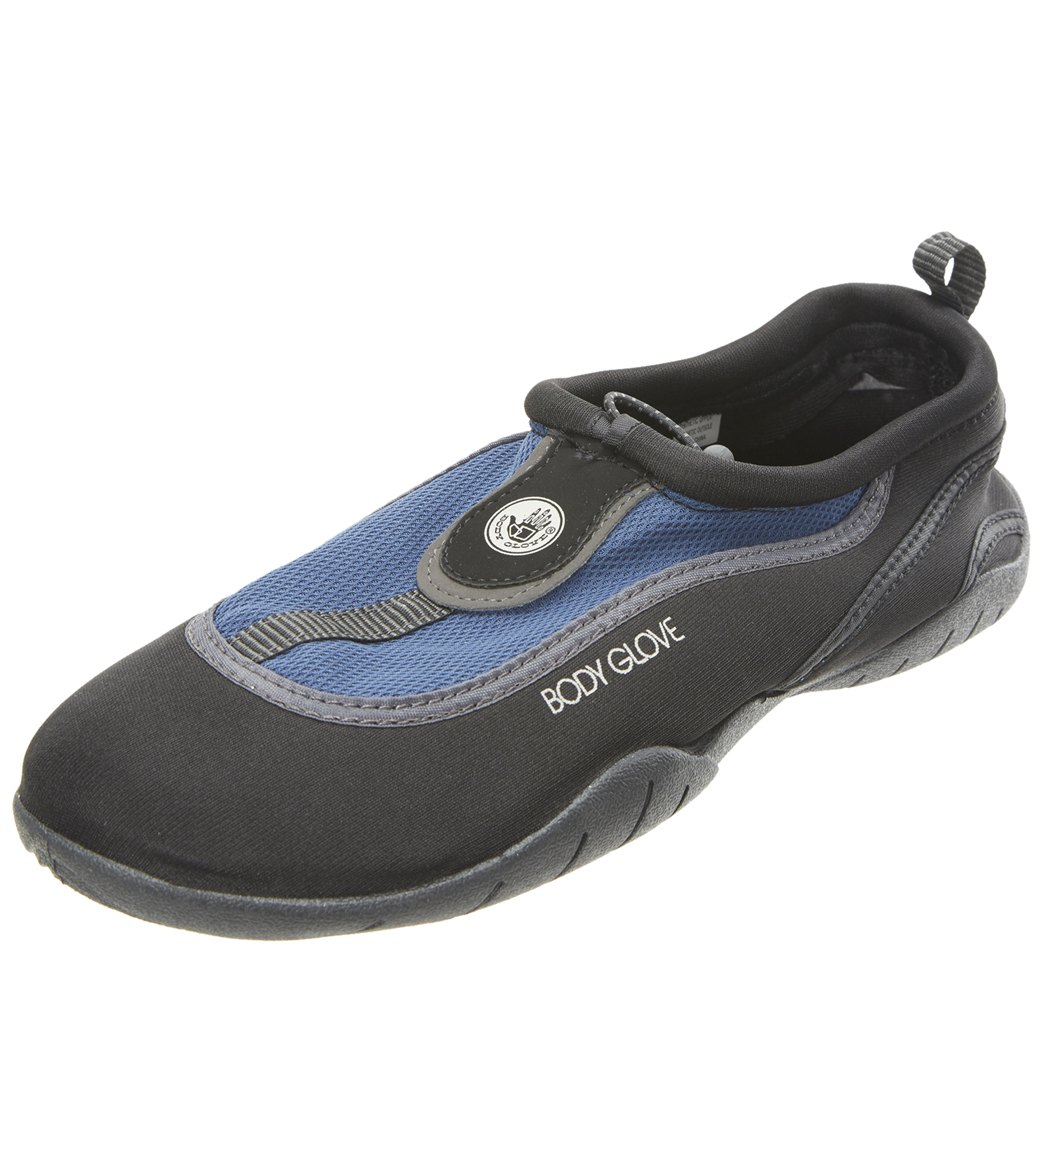 df8c65db53df Body Glove Men s Riptide III Water Shoe at SwimOutlet.com